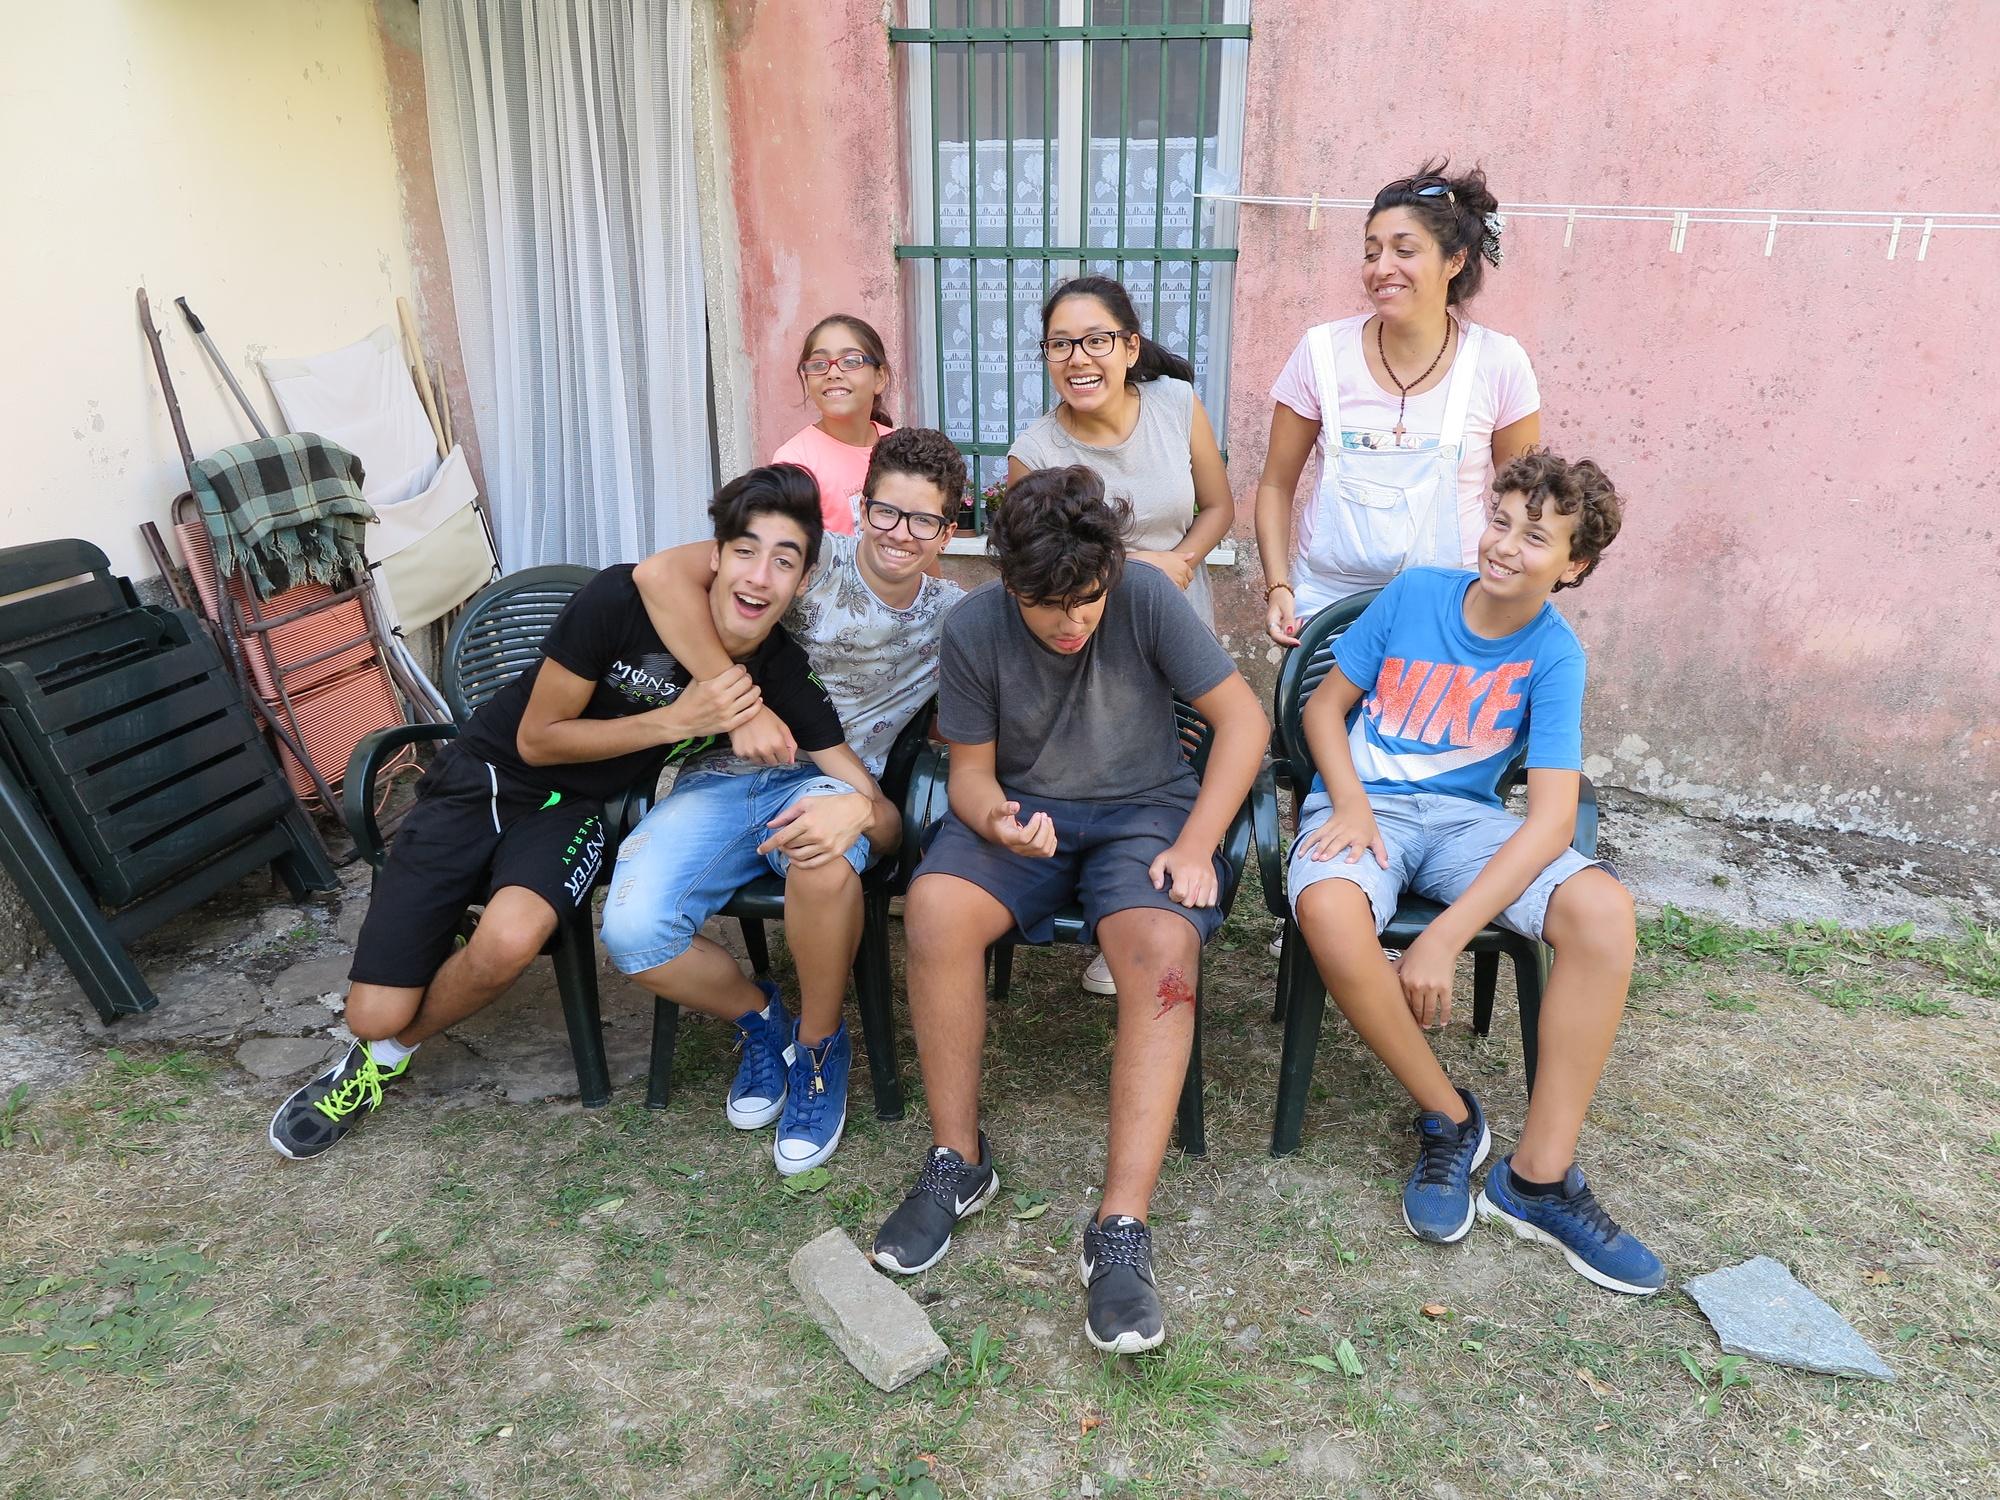 cresimati-carpeneto-2016-09-09-15-46-02